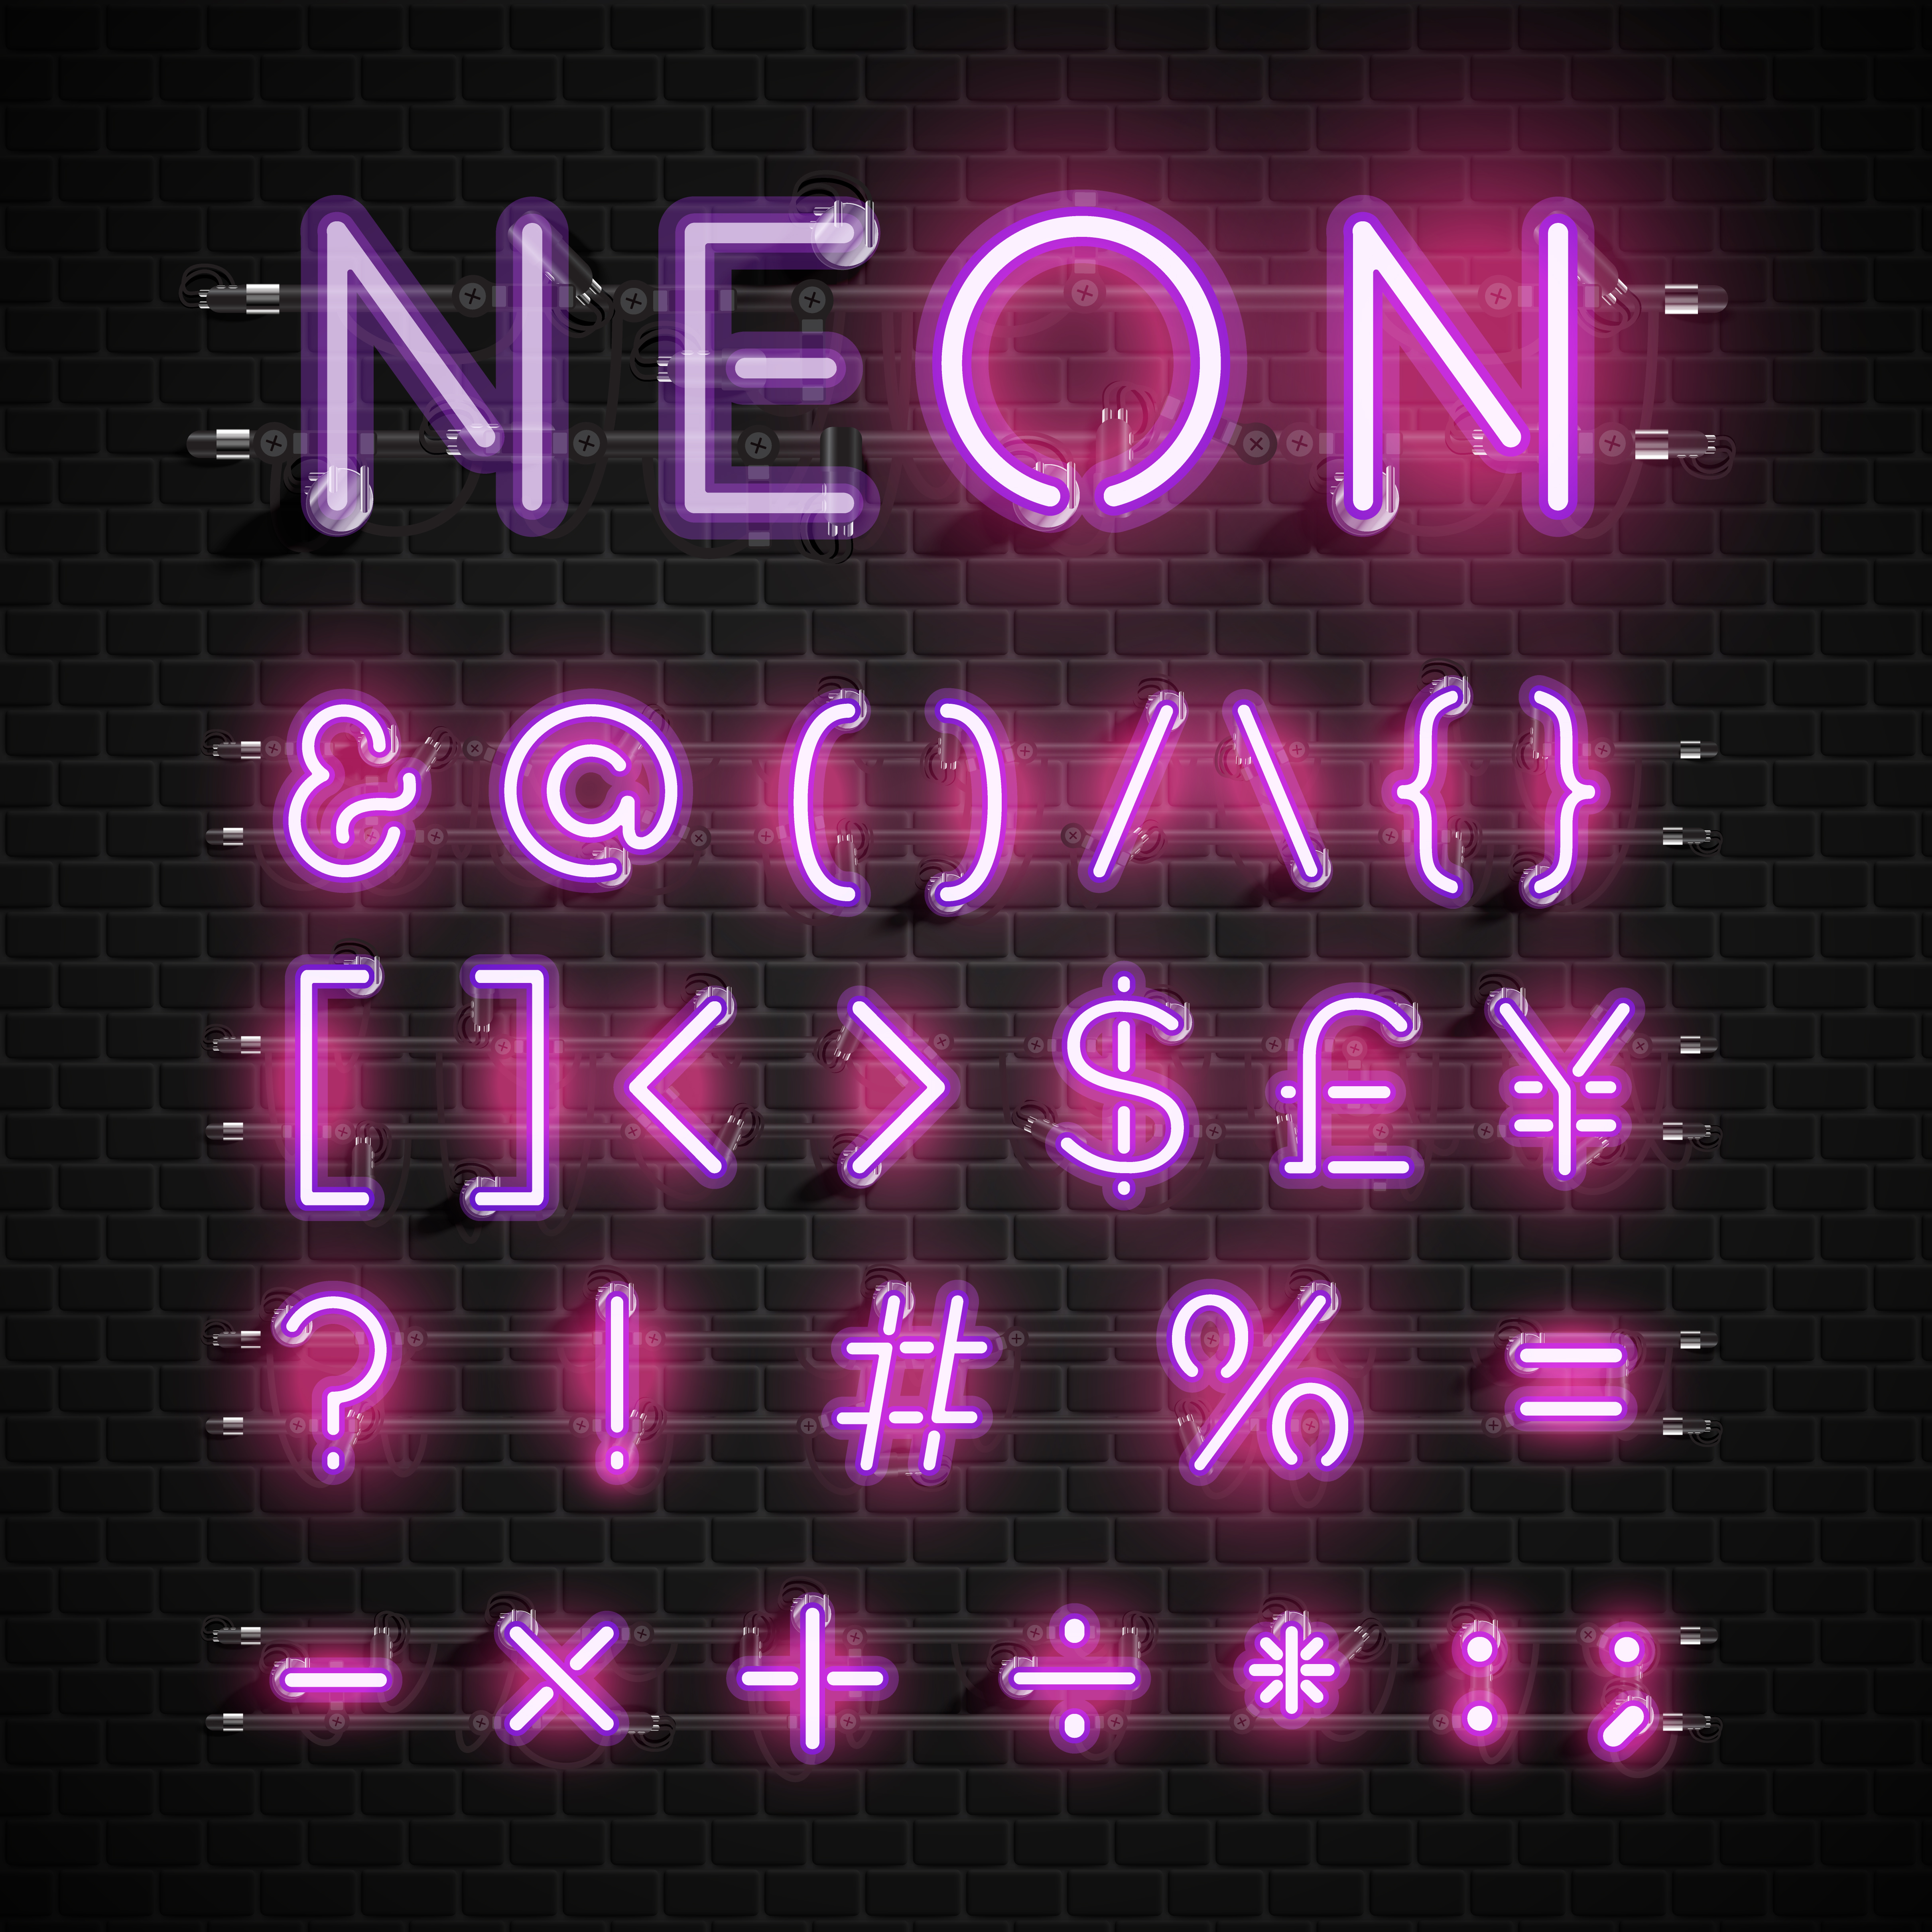 Neon Fonts Free Vector Art - (7,987 Free Downloads)